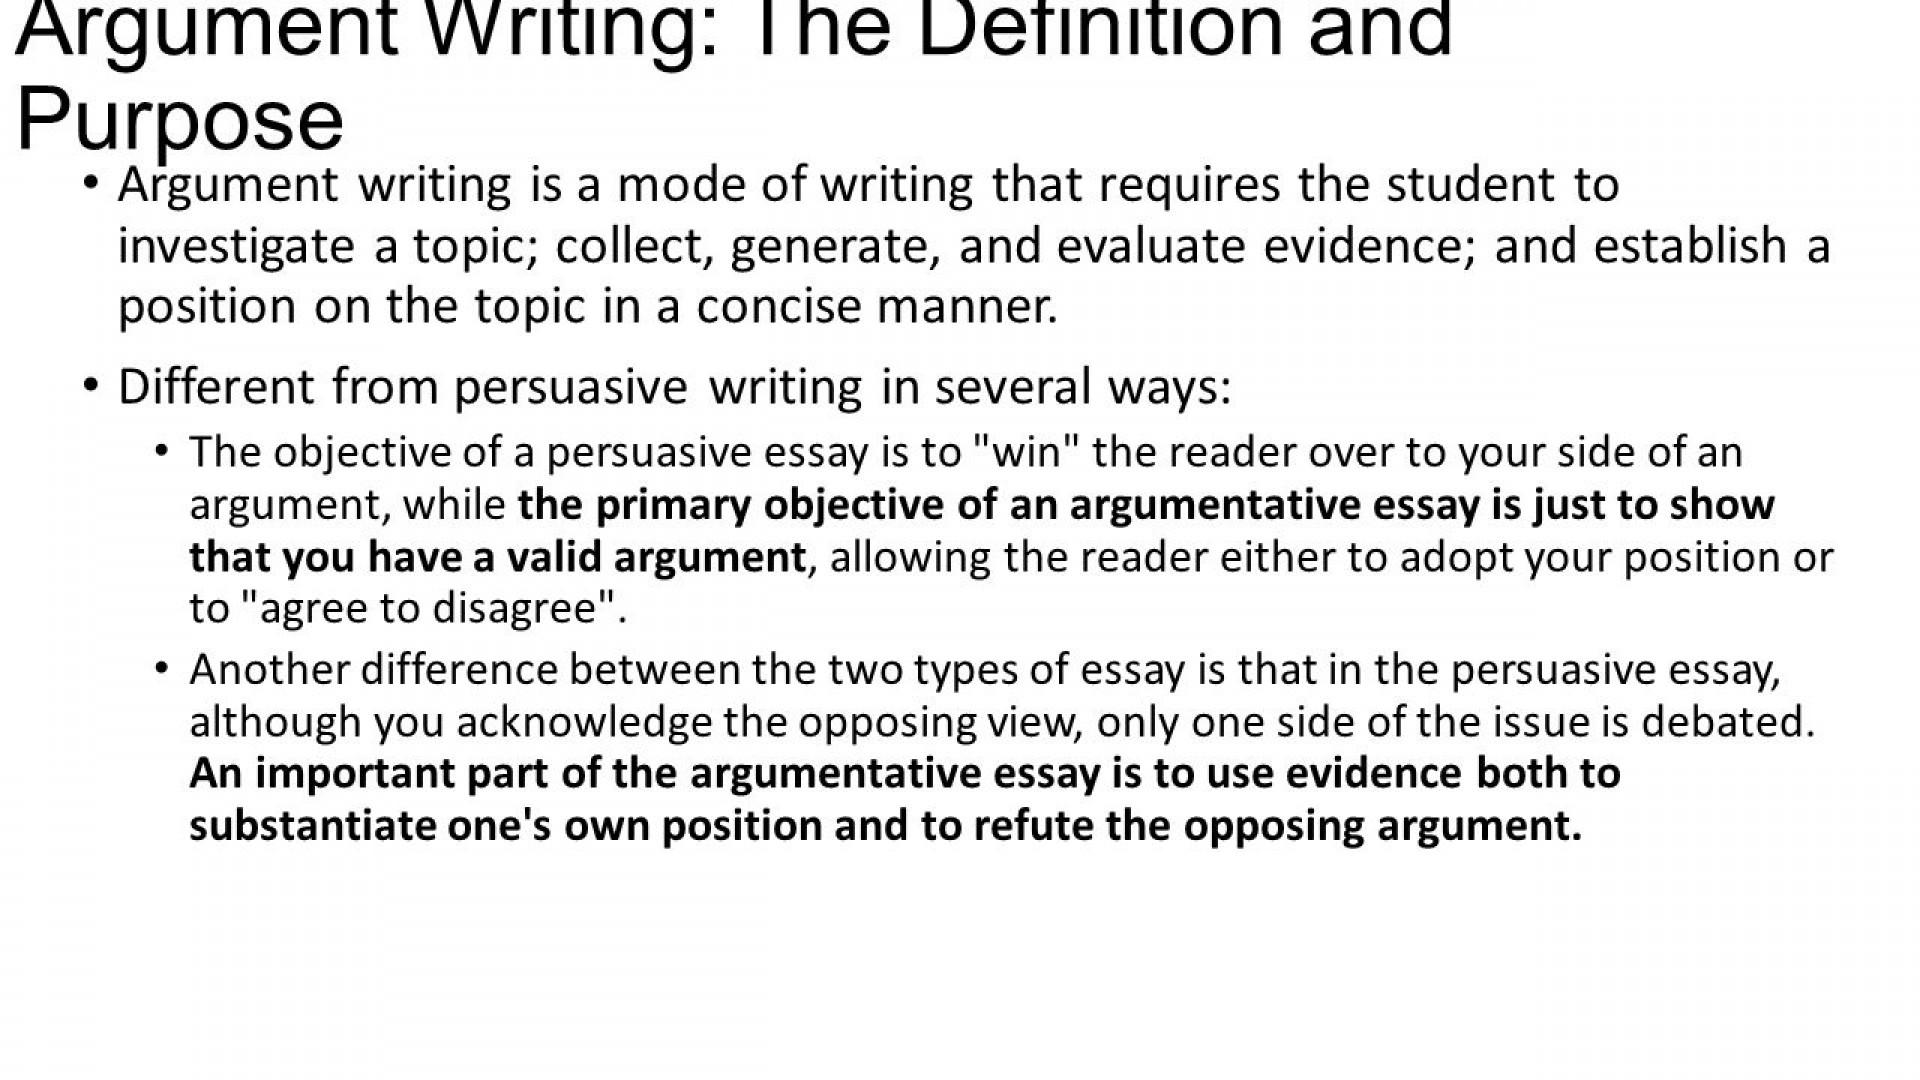 003 Slide Argumentative Writing Definition Essay Fearsome Define Persuasive/argumentative Pdf 1920